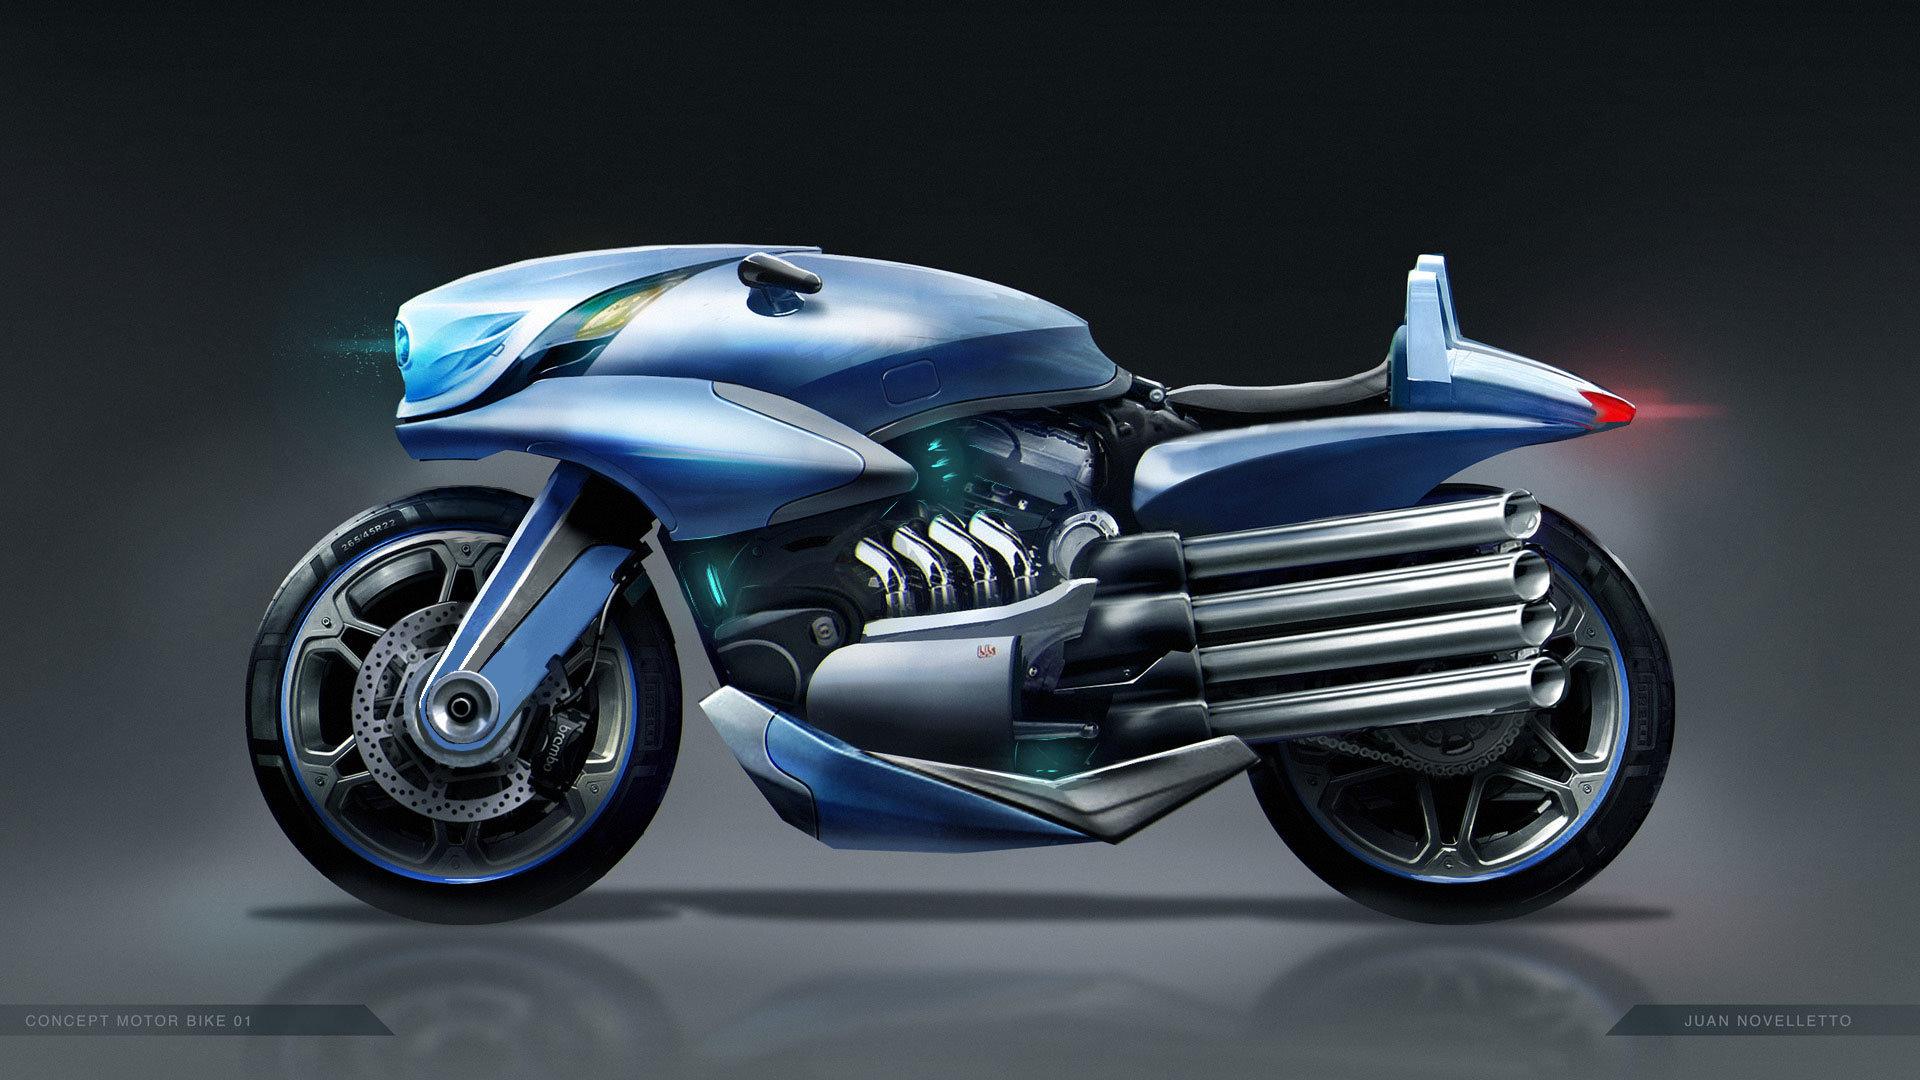 Concept Motorbike 01